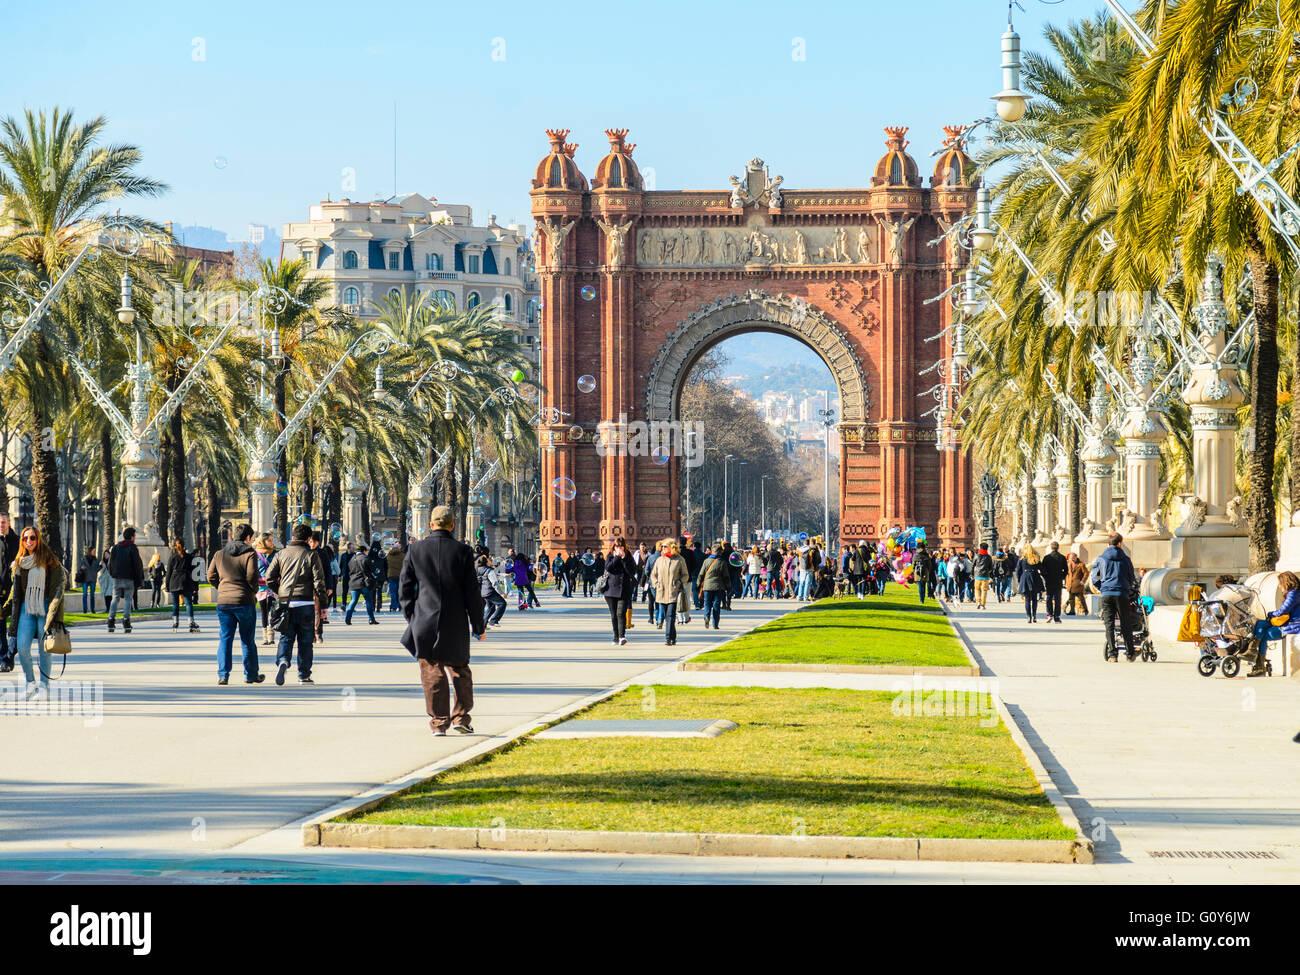 Arco de Triunfo de Barcelona aka Arc de Triomf, Passeig de Lluís Companys, Barcelona, Spain Stock Photo